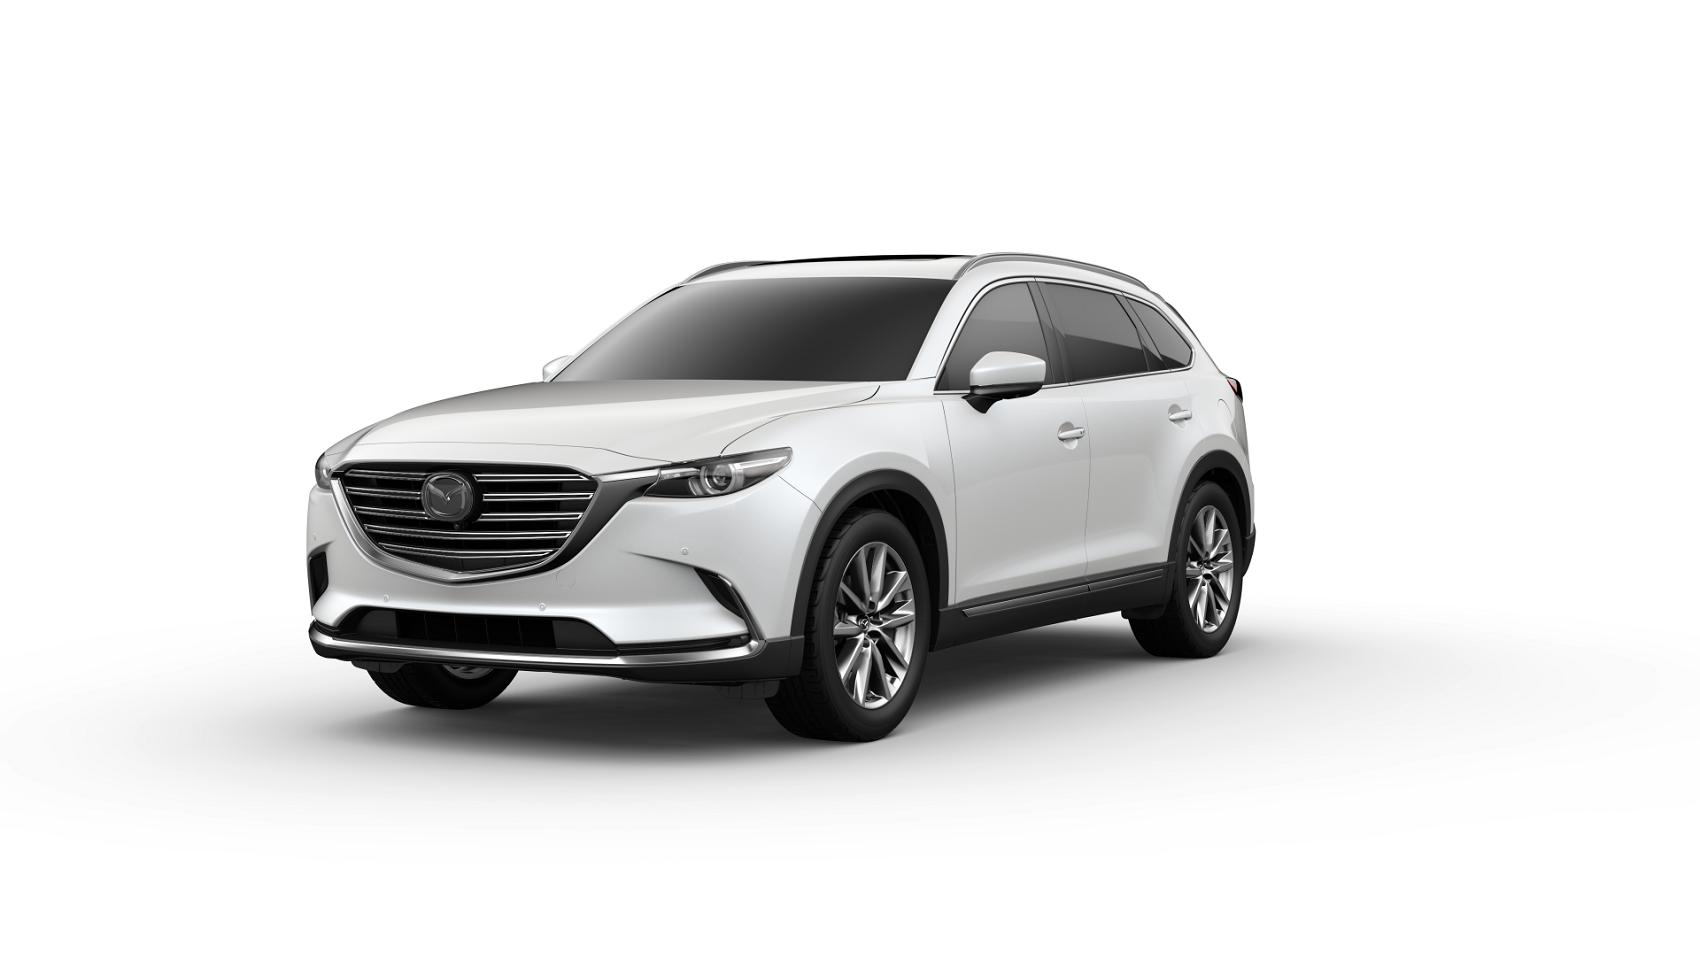 2019 Mazda CX9 Snowflake White Pearl